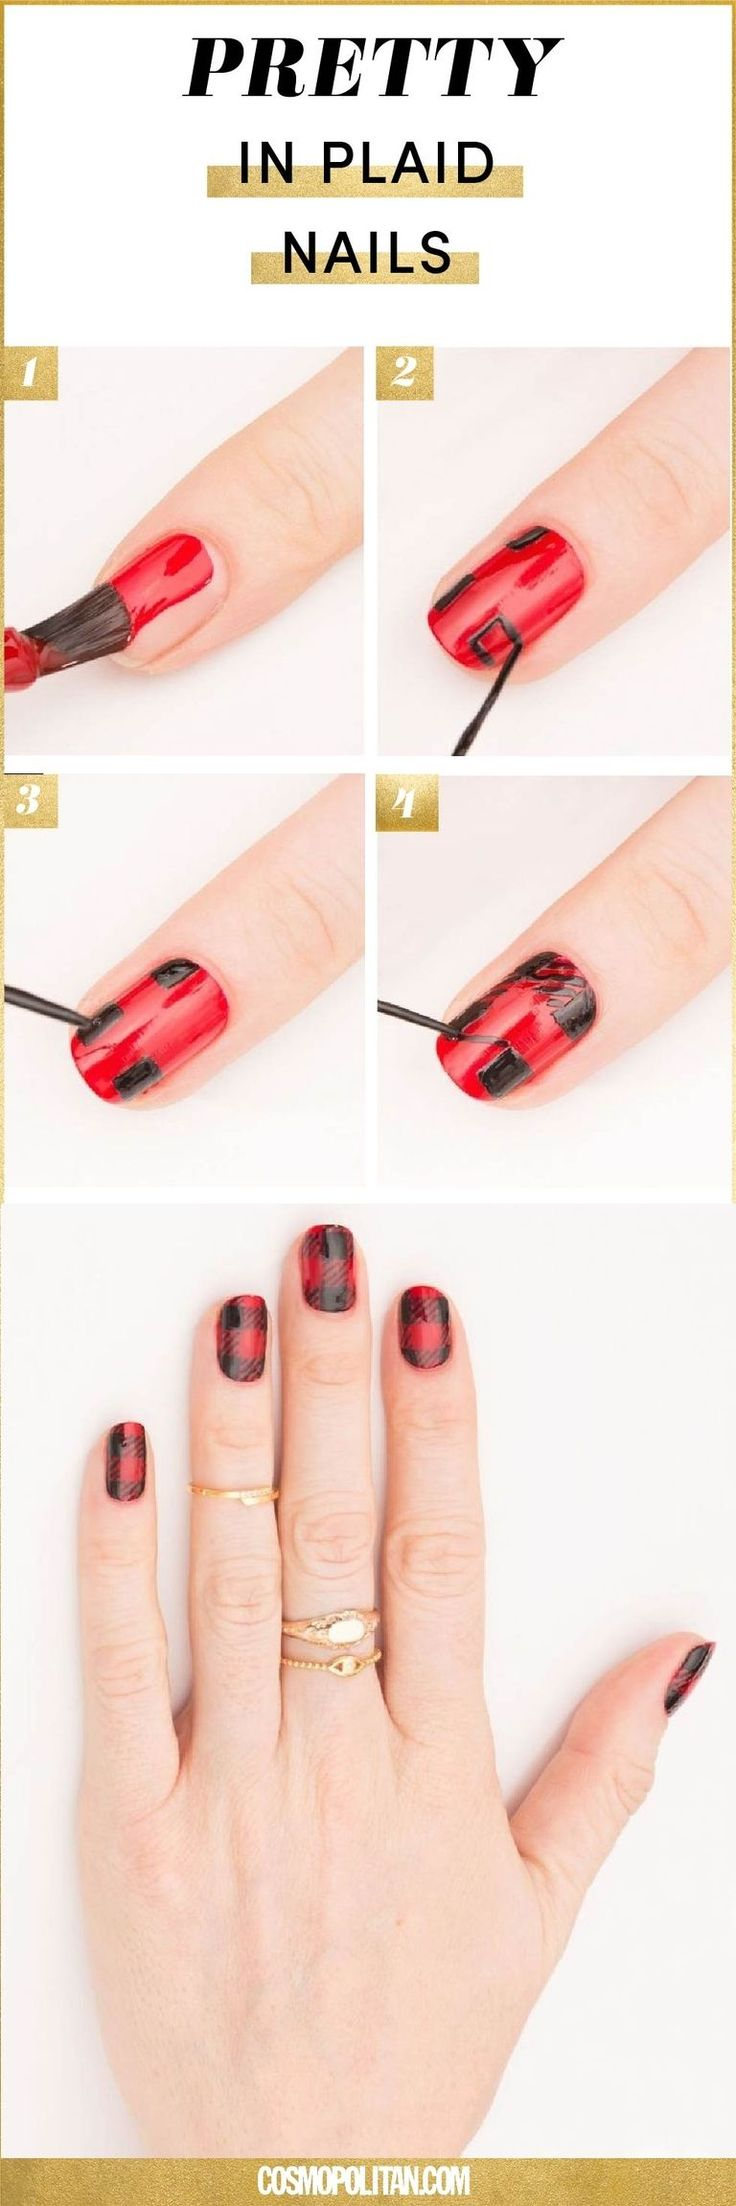 Pins check out www mynailpolishobsession com for more nail art ideas - 7 Holiday Nail Art Ideas For 2017 Diy Christmas Nail Art Tutorials